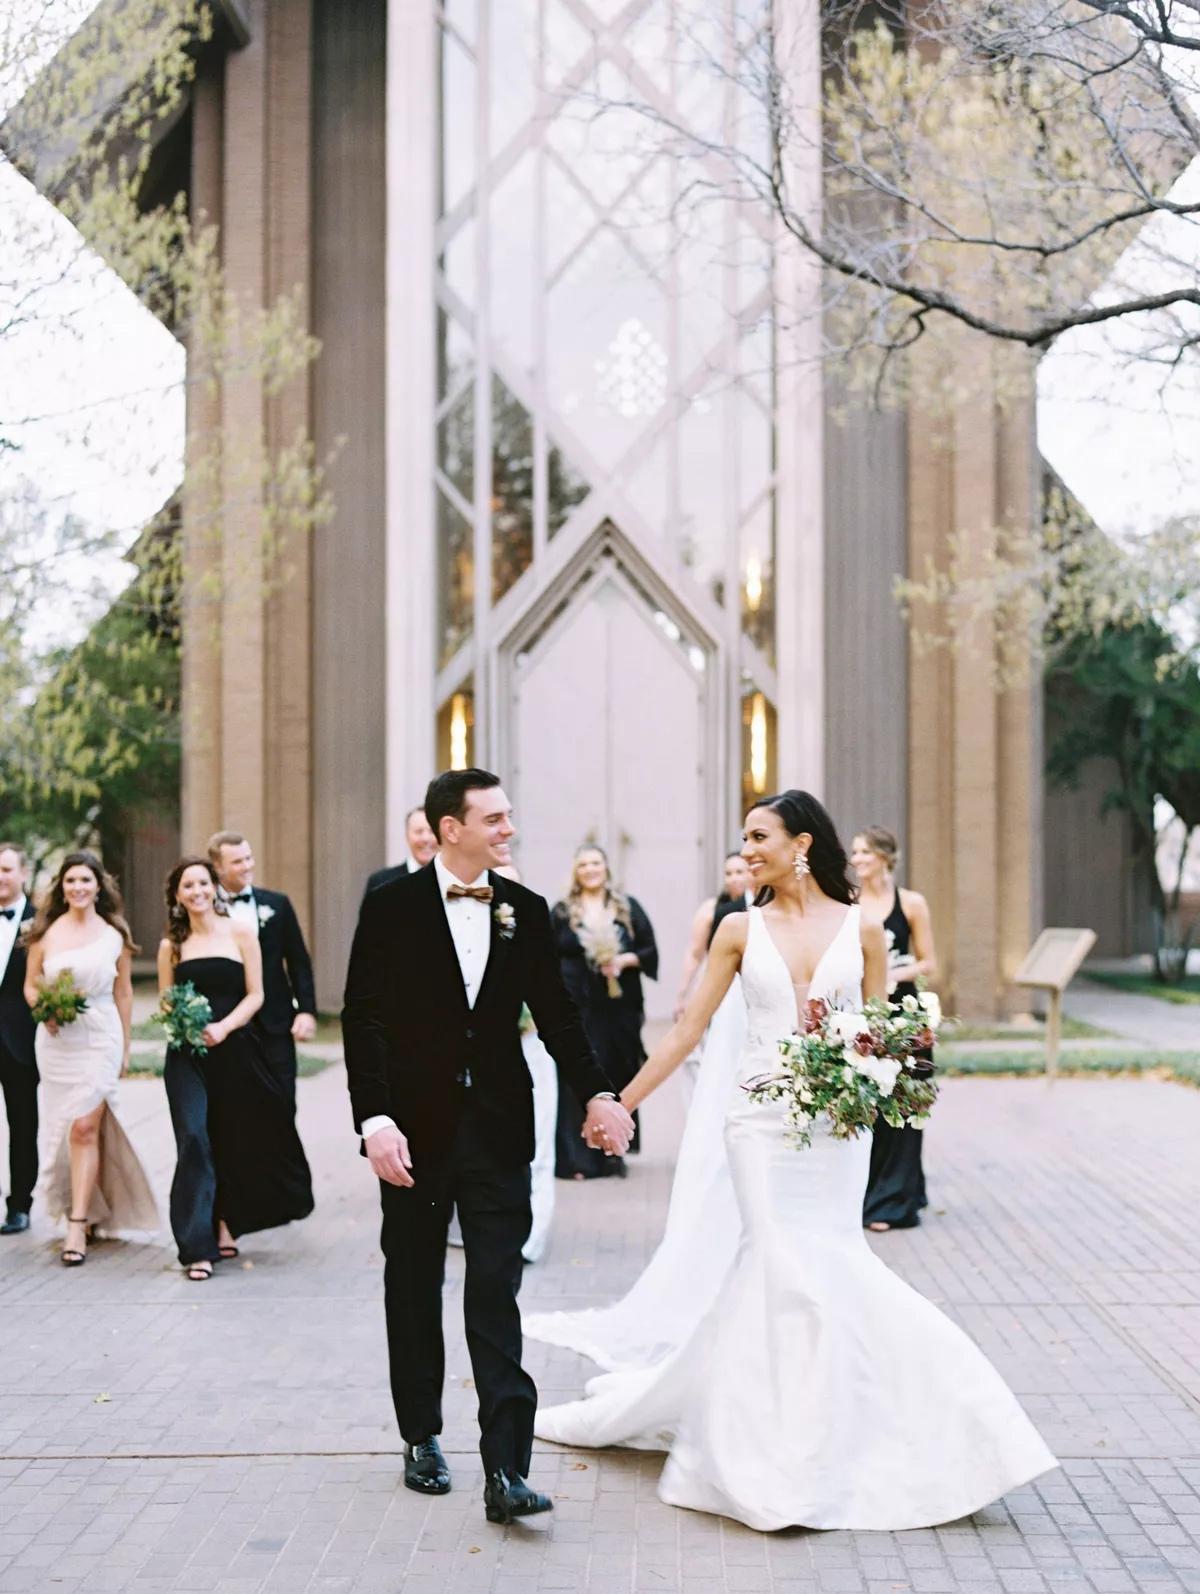 29EmLImQgEk - Как найти веселого ведущего на свою свадьбу